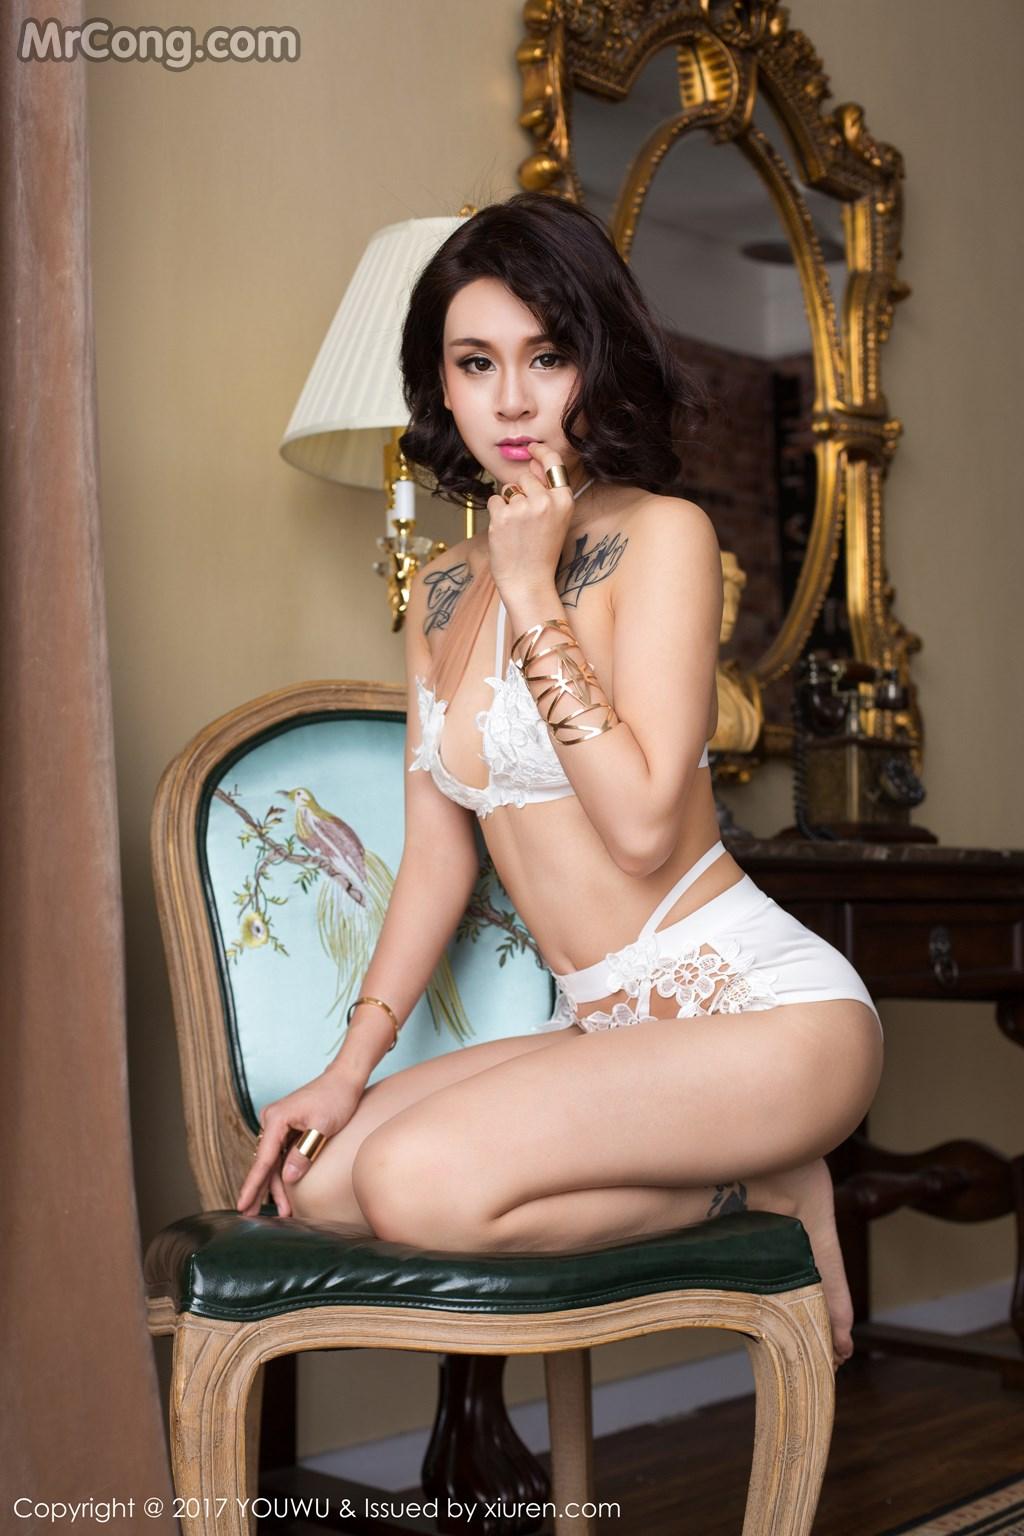 YouWu Vol.049: Người mẫu Amrita Zhen Zhen (Amrita贞贞) (55 ảnh)